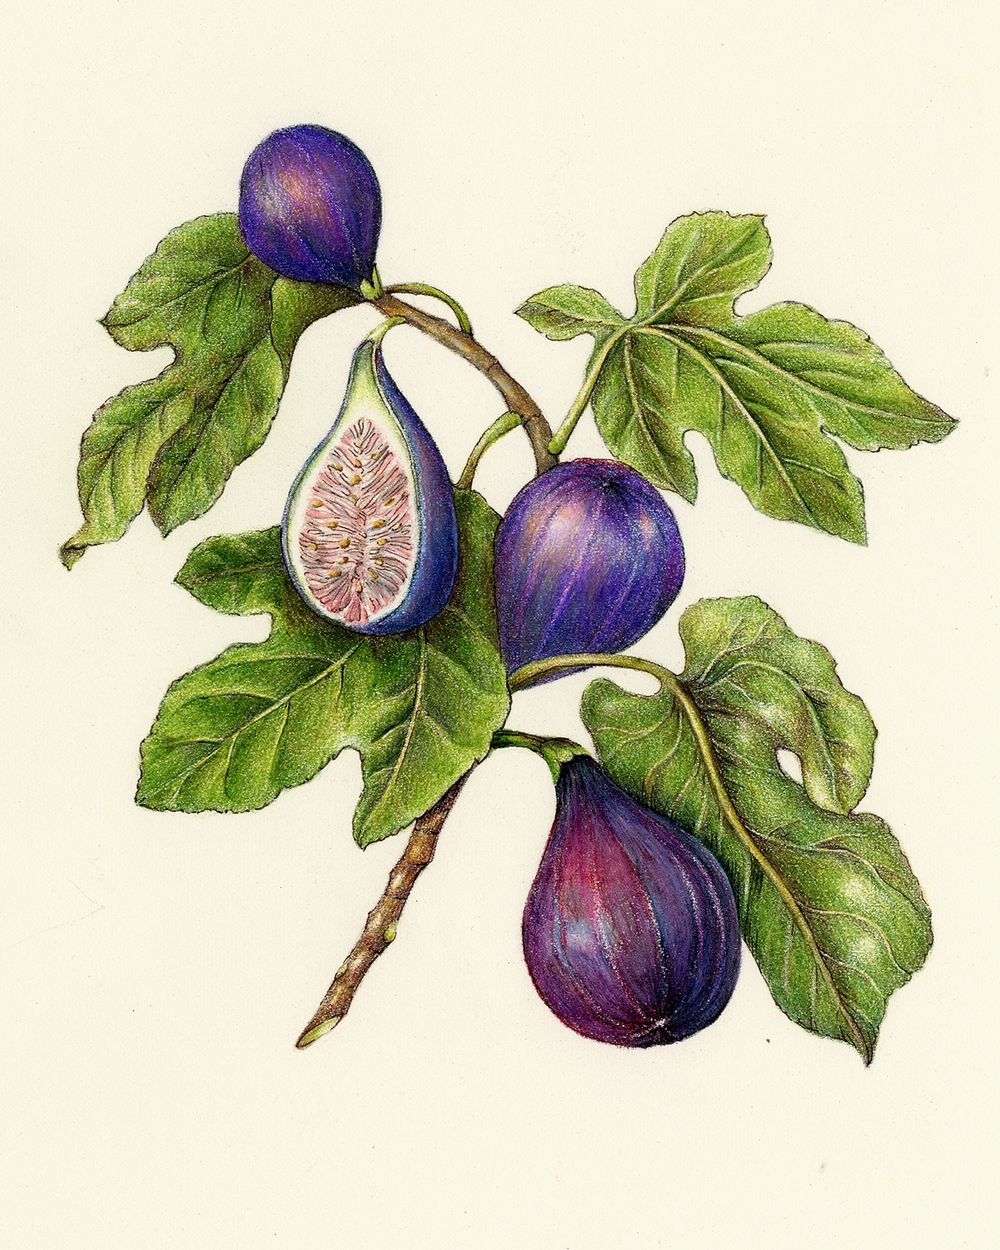 Fig - Ficus carica